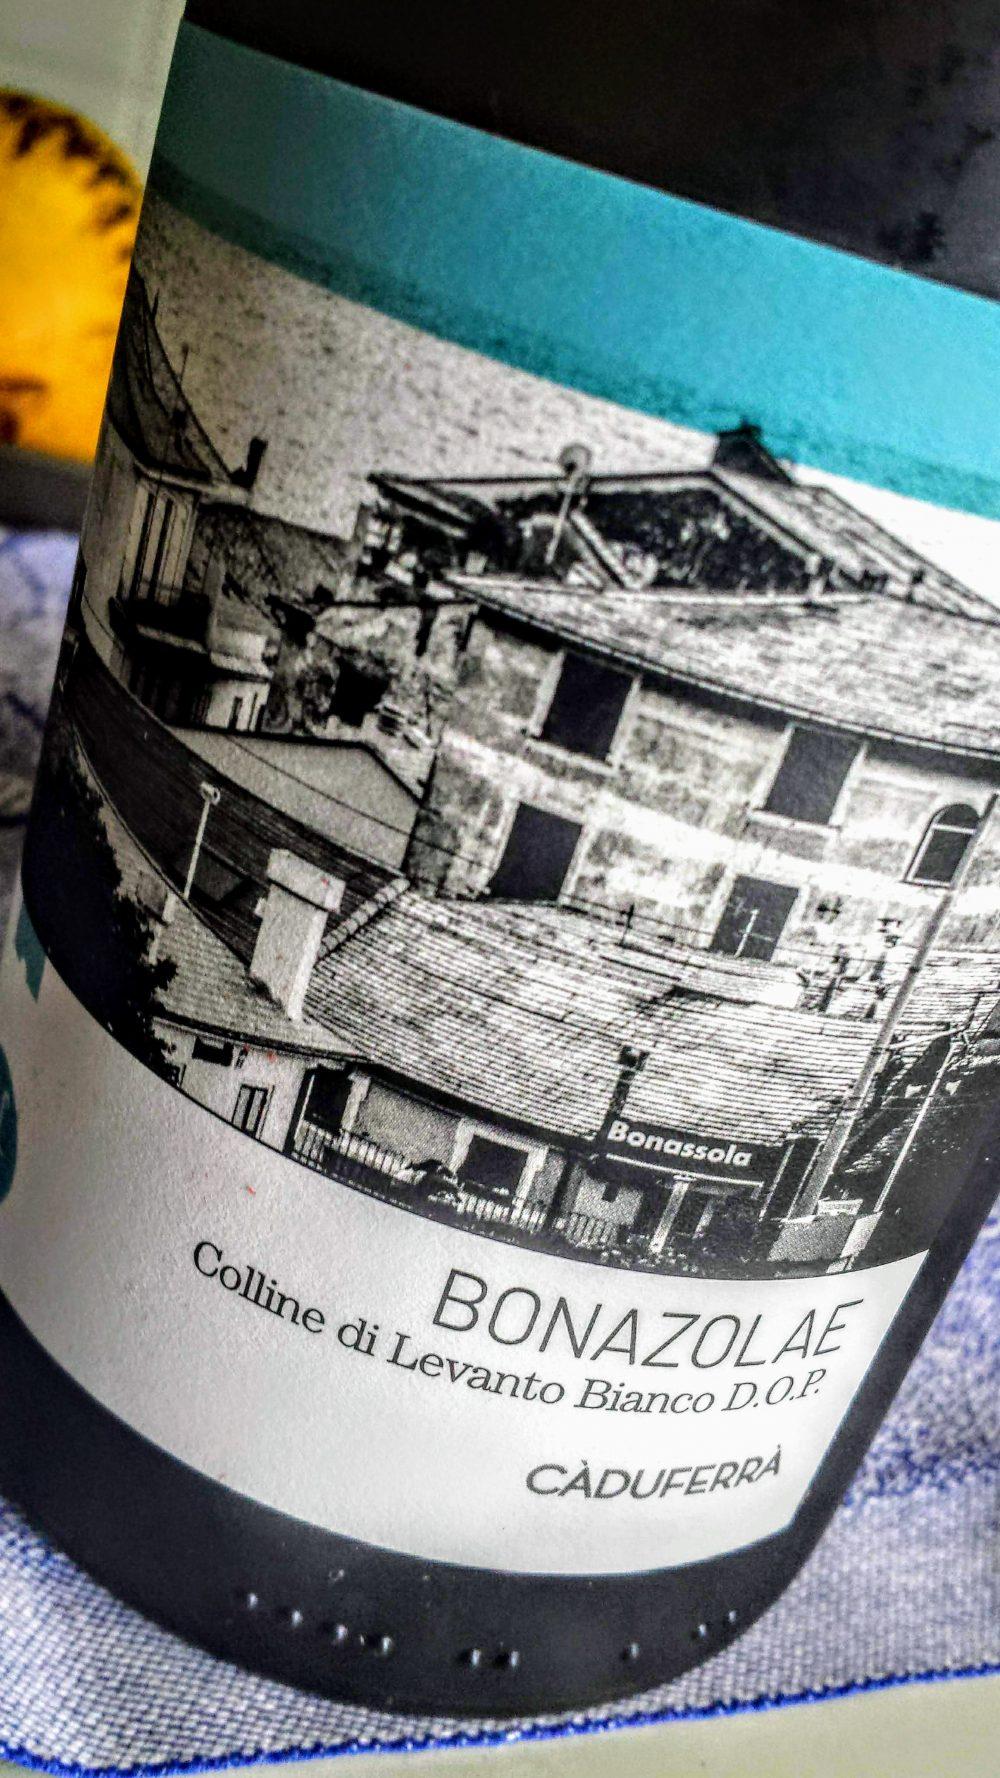 Bonazolae 2017, Ca' du Ferra'